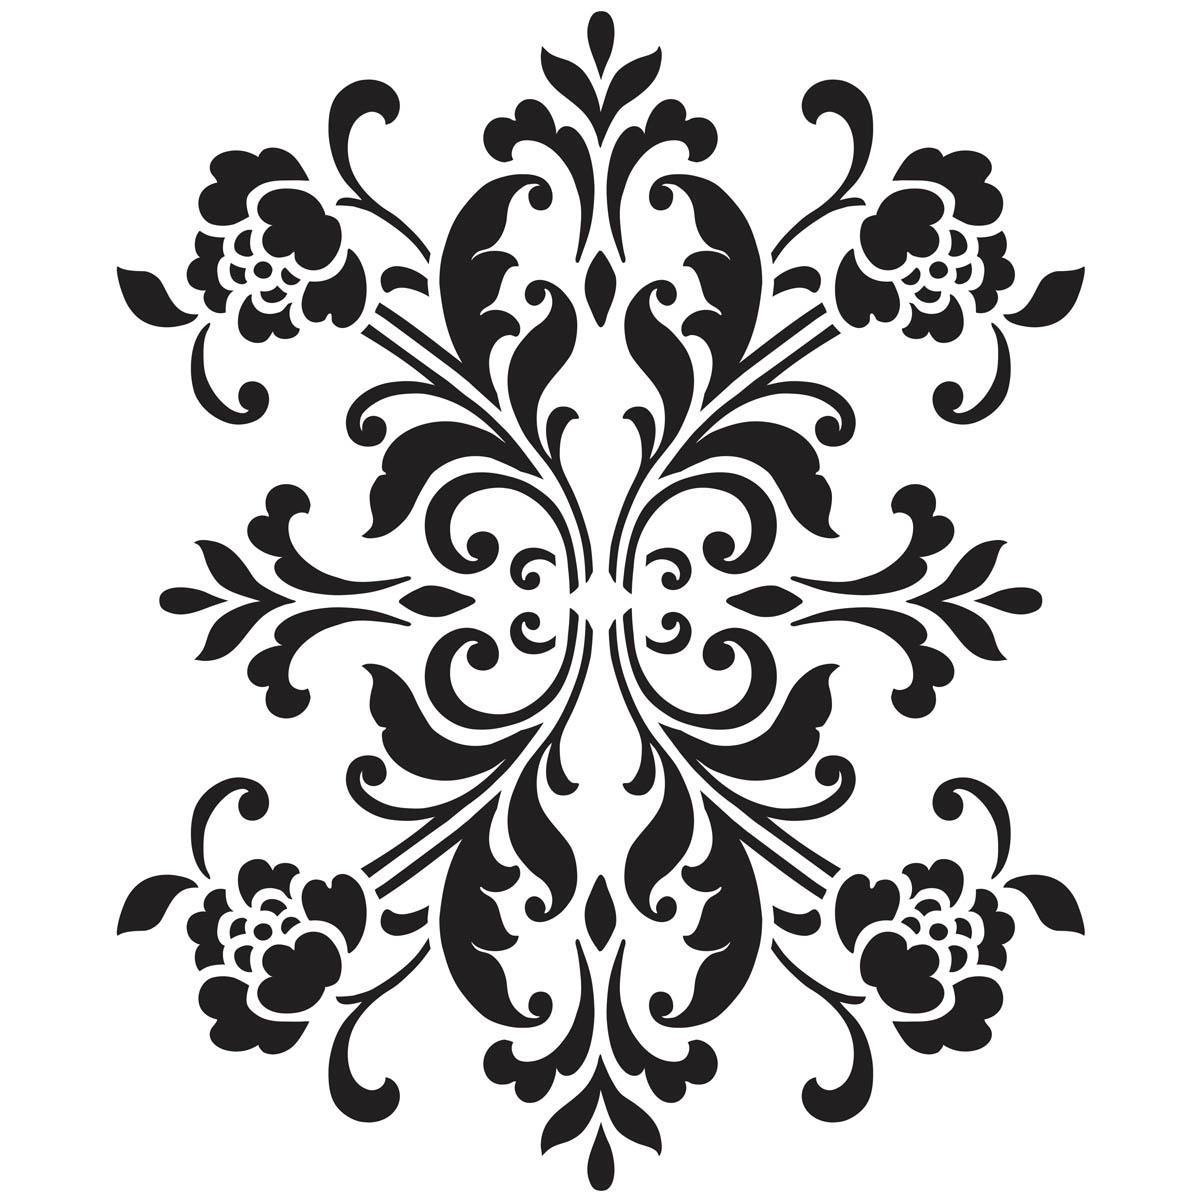 Waverly ® Inspirations Laser Stencils - Accent - Damask Floral, 6